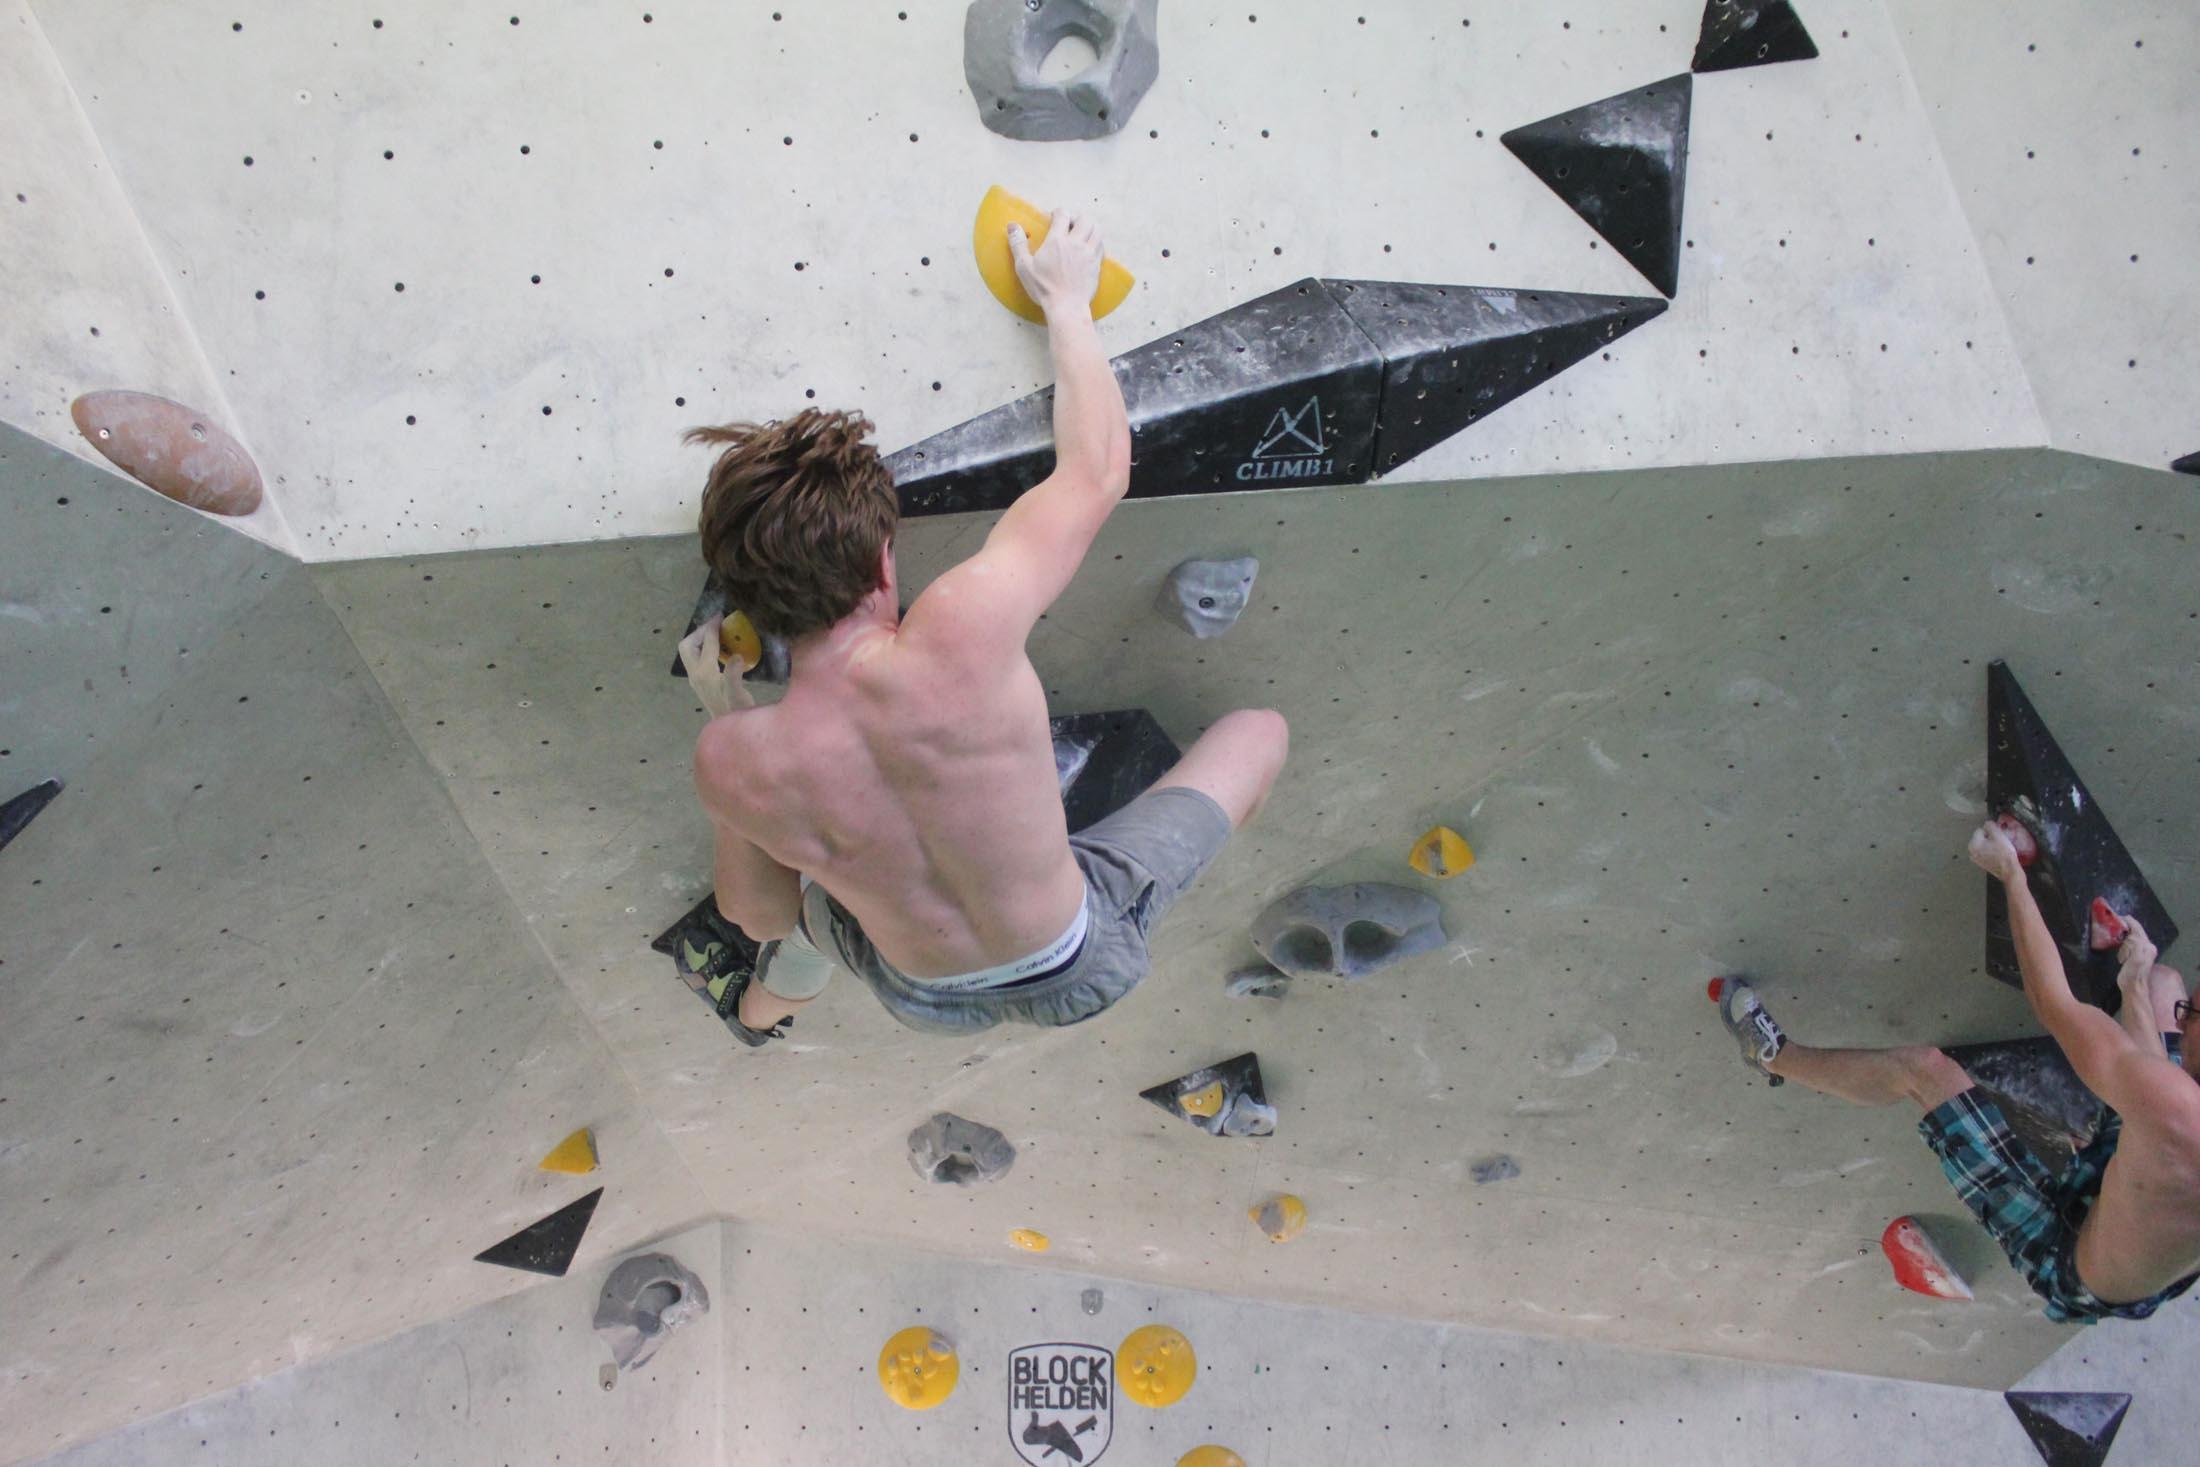 Quali, internationaler bouldercup Frankenjura 2016, BLOCKHELDEN Erlangen, Mammut, Bergfreunde.de, Boulderwettkampf07092016271